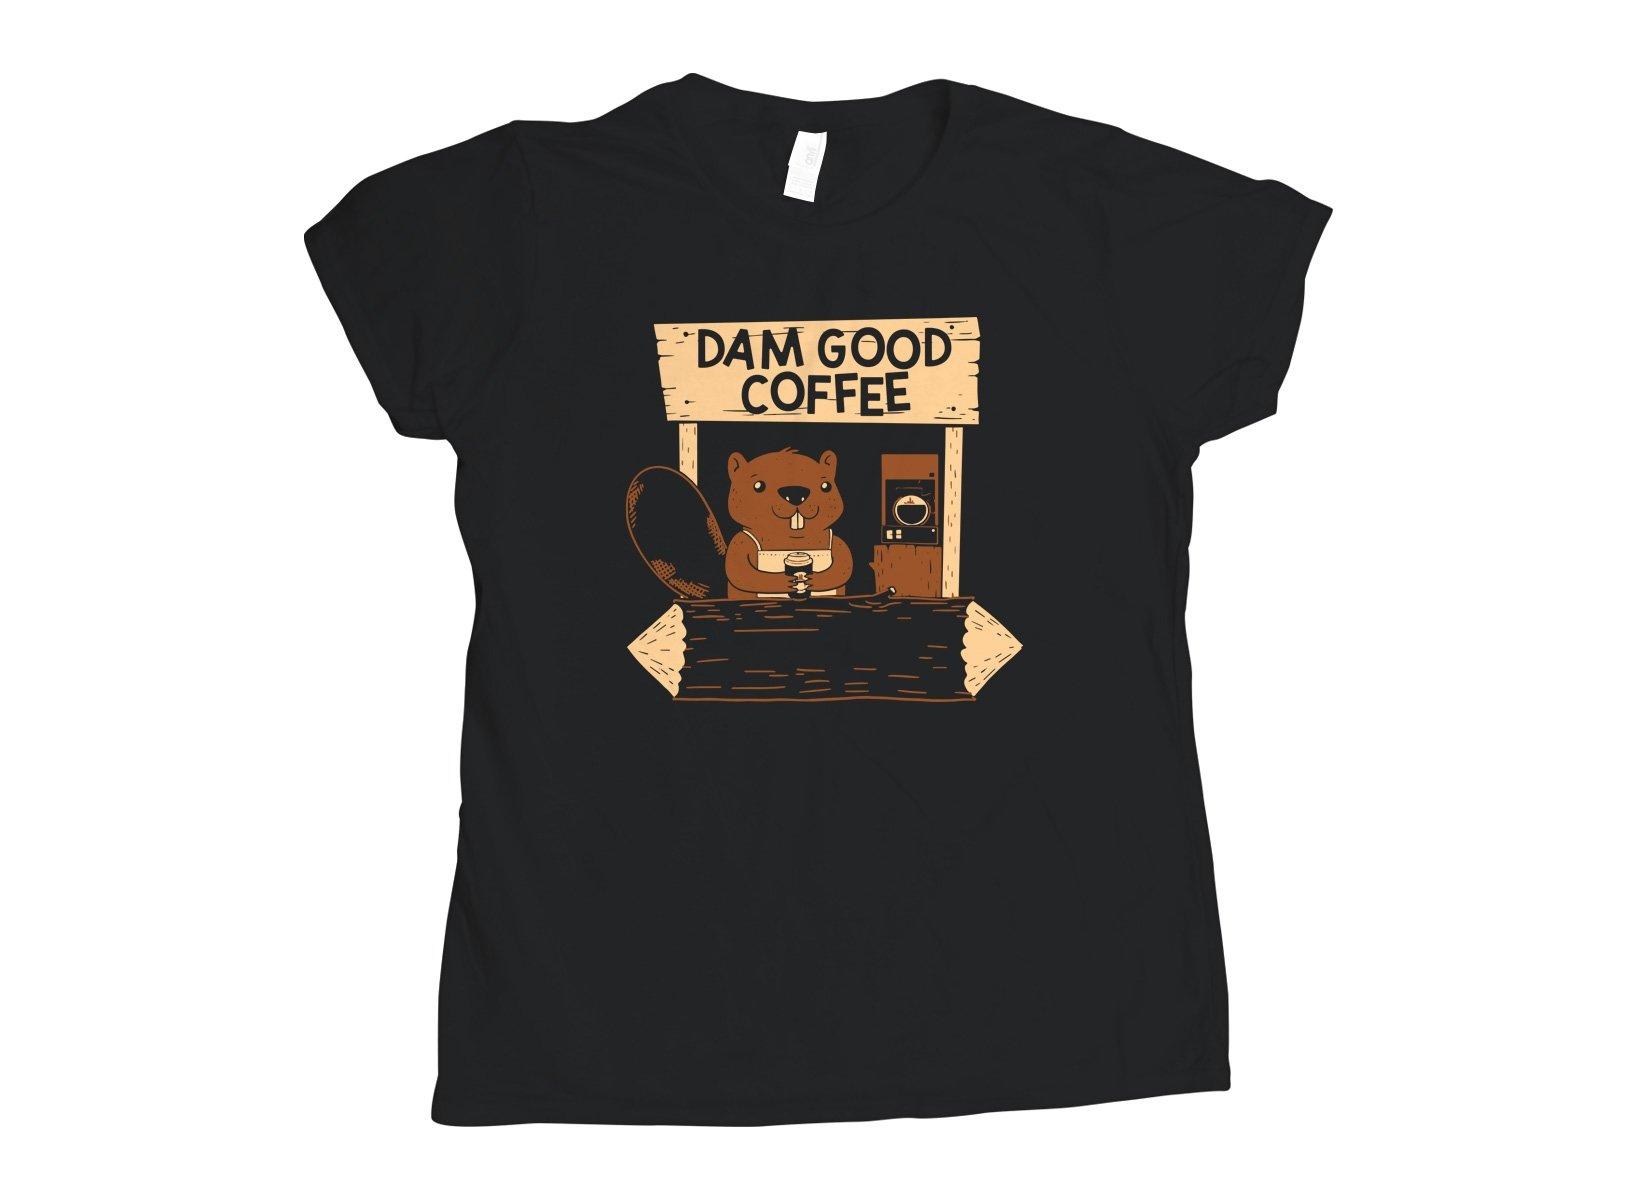 Dam Good Coffee on Womens T-Shirt